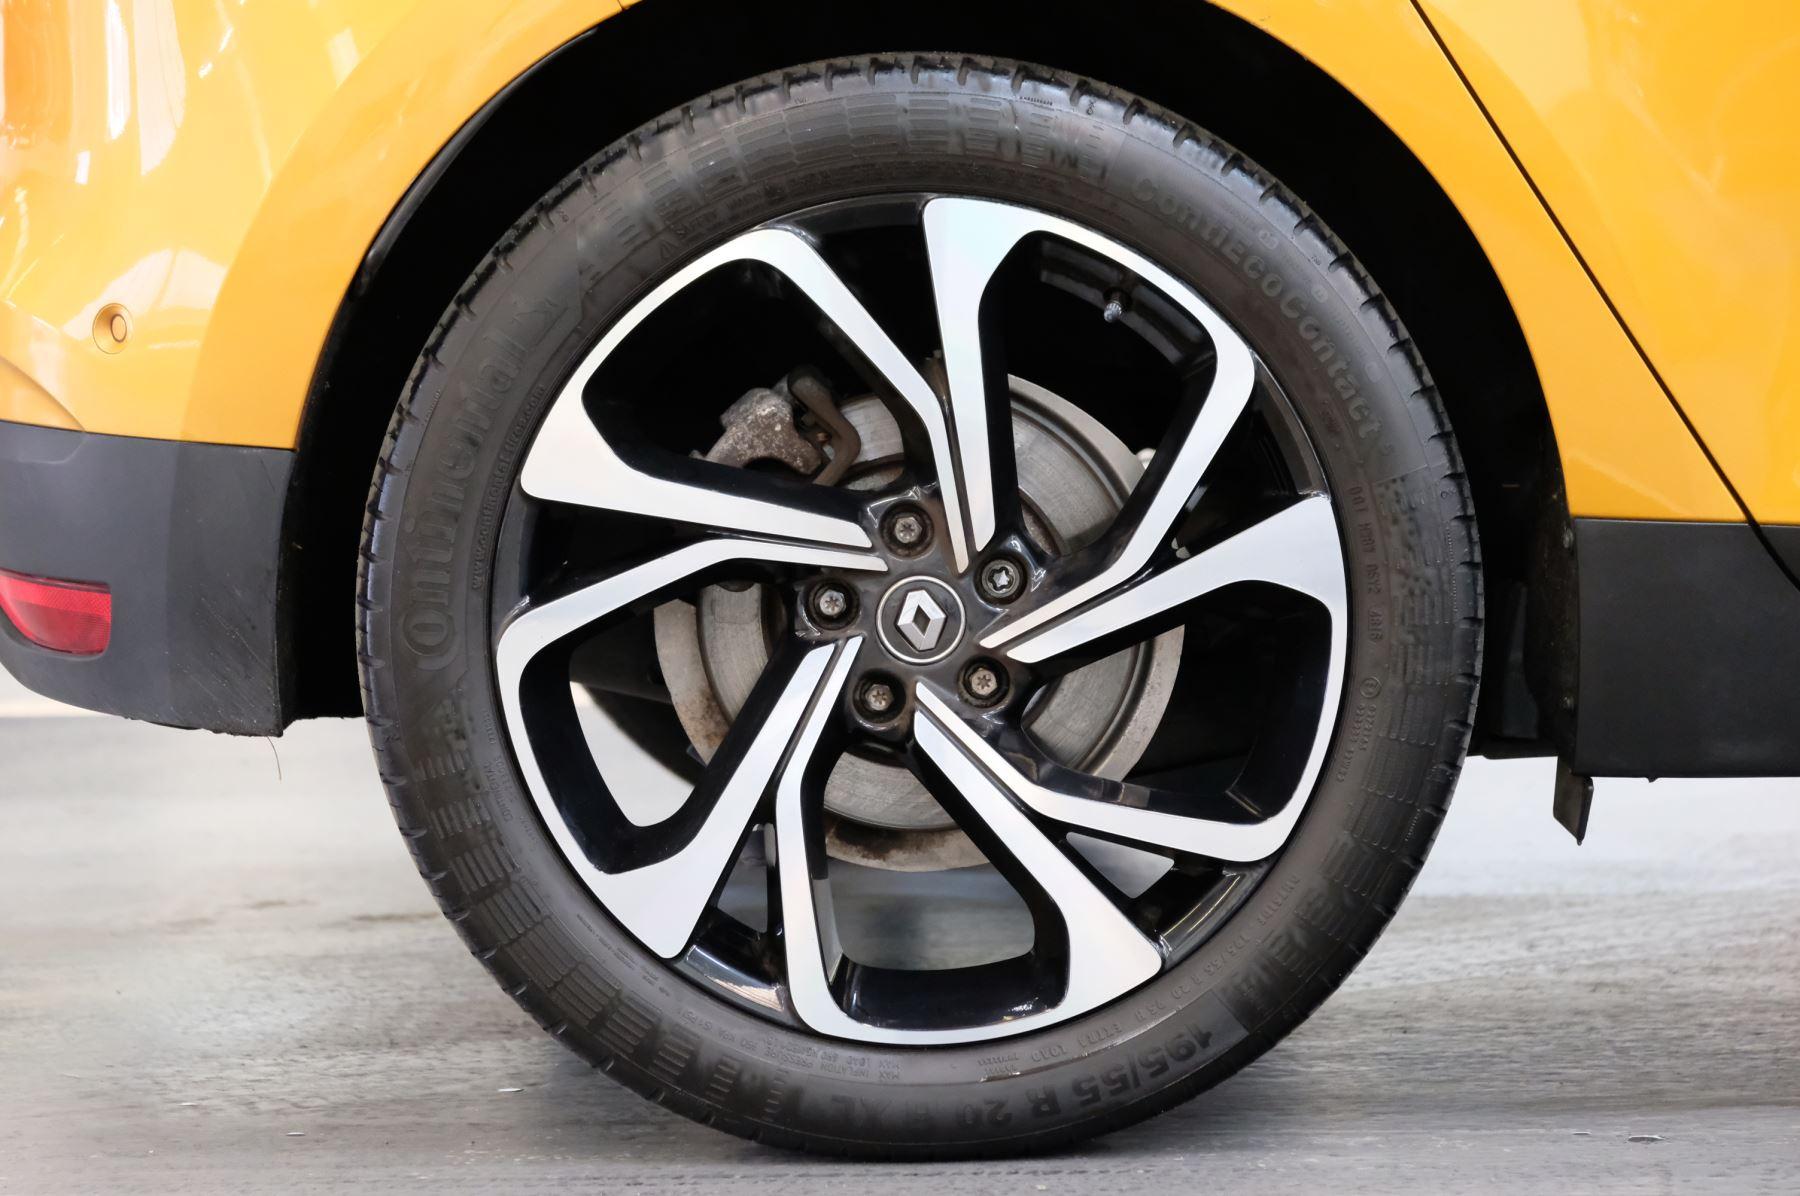 Renault Scenic 1.6 dCi Signature Nav 5dr image 8